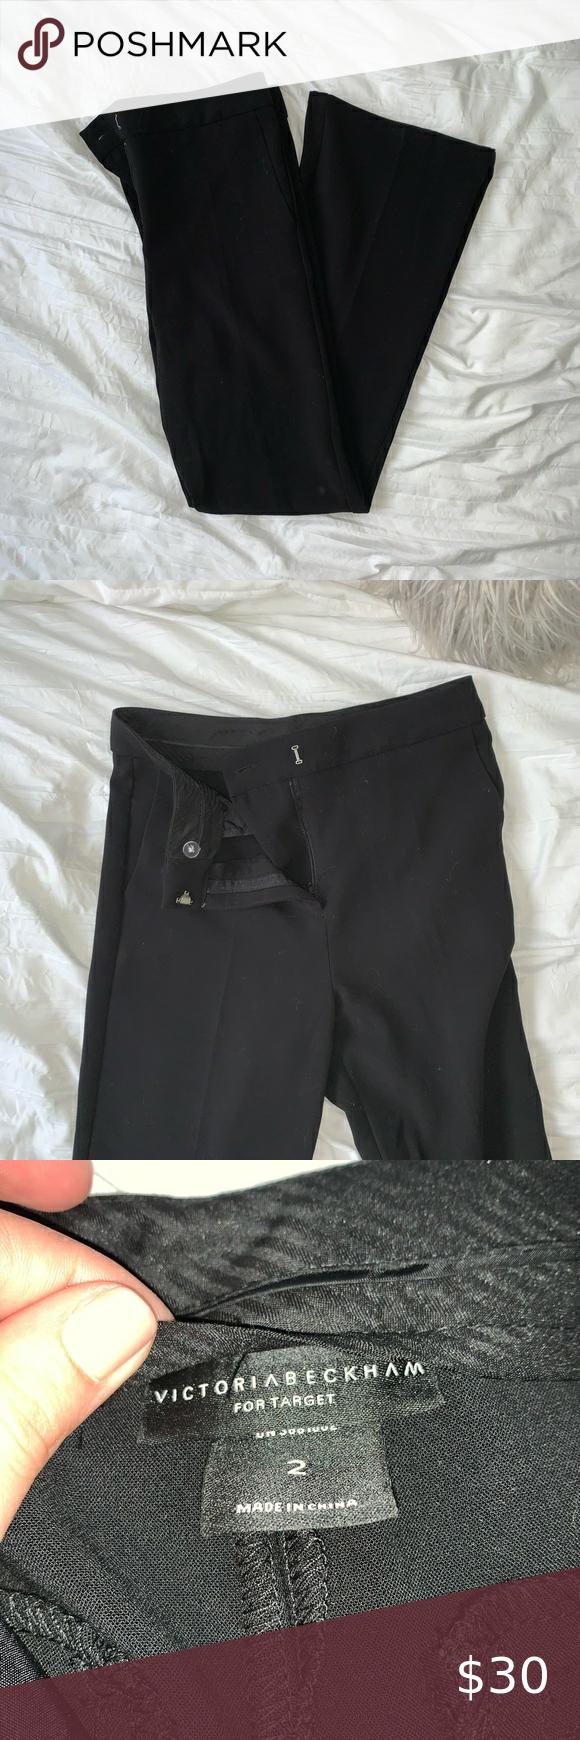 Victoria Beckham Black Flare Dress Pants Slacks In 2020 Flare Dress Pants Black Flare Dress Flare Dress [ 1740 x 580 Pixel ]